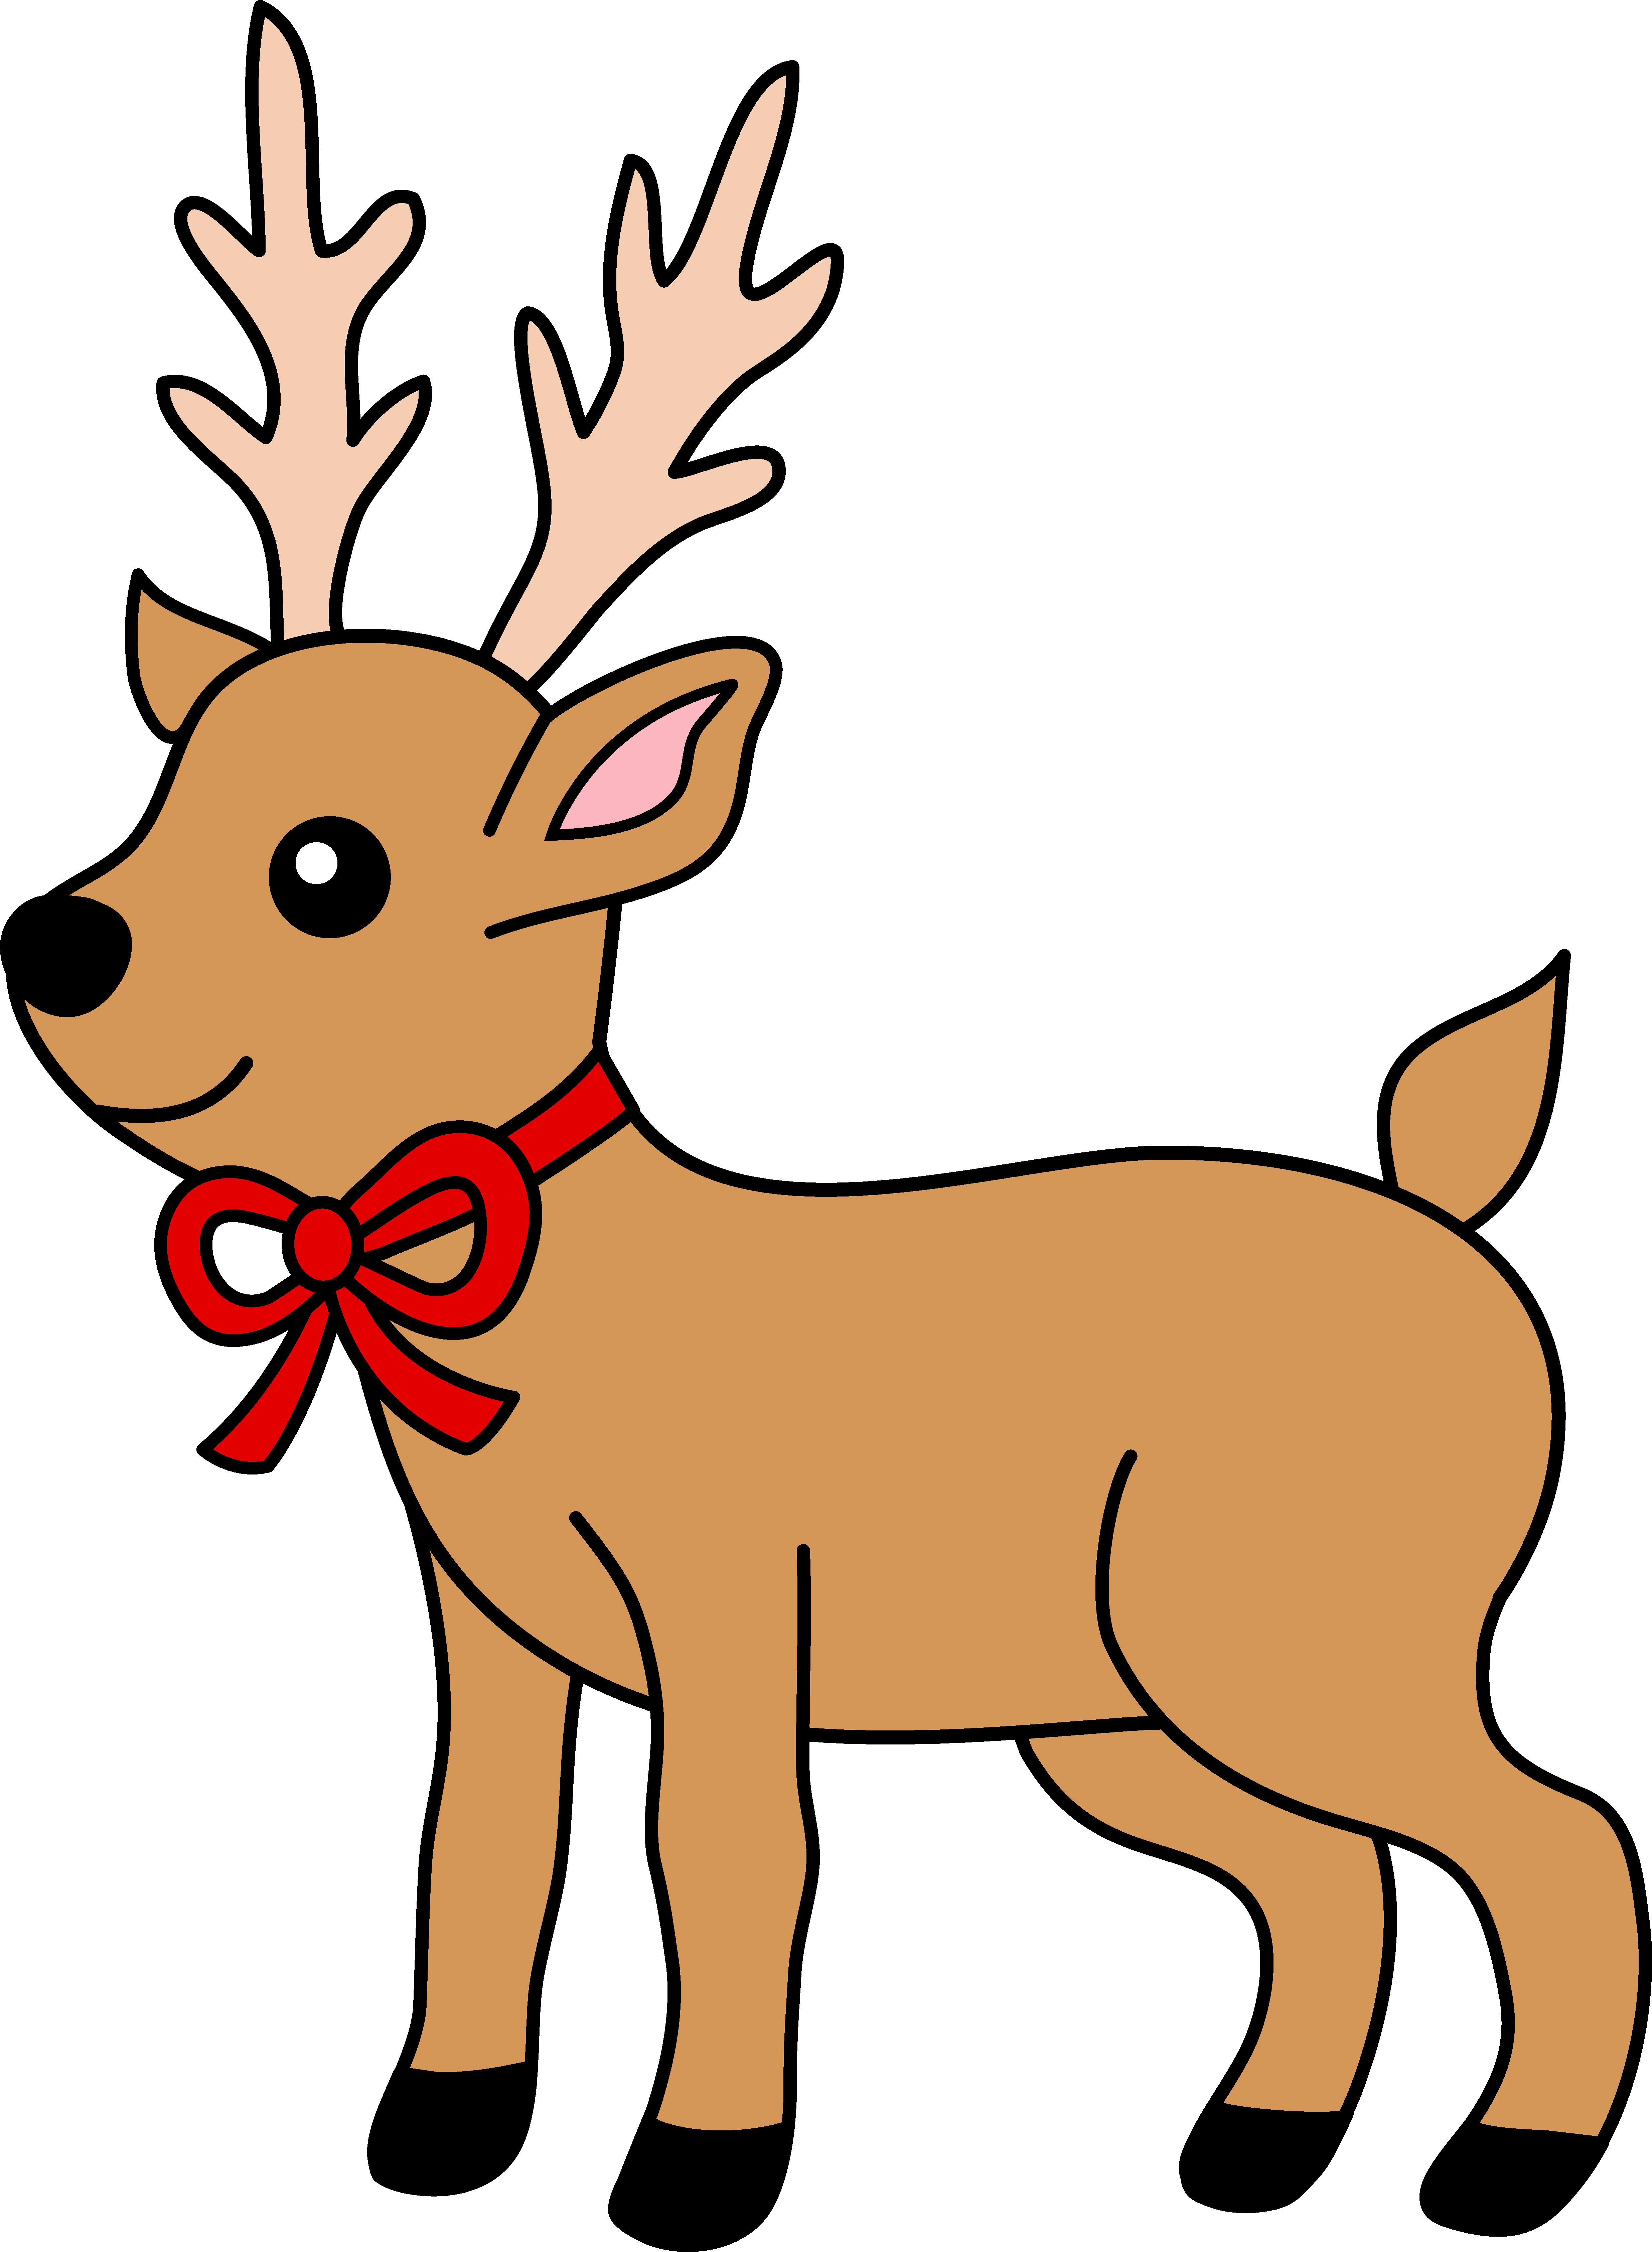 Christmas Reindeer Clipart Clip Art Library Reindeer Drawing Clip Art